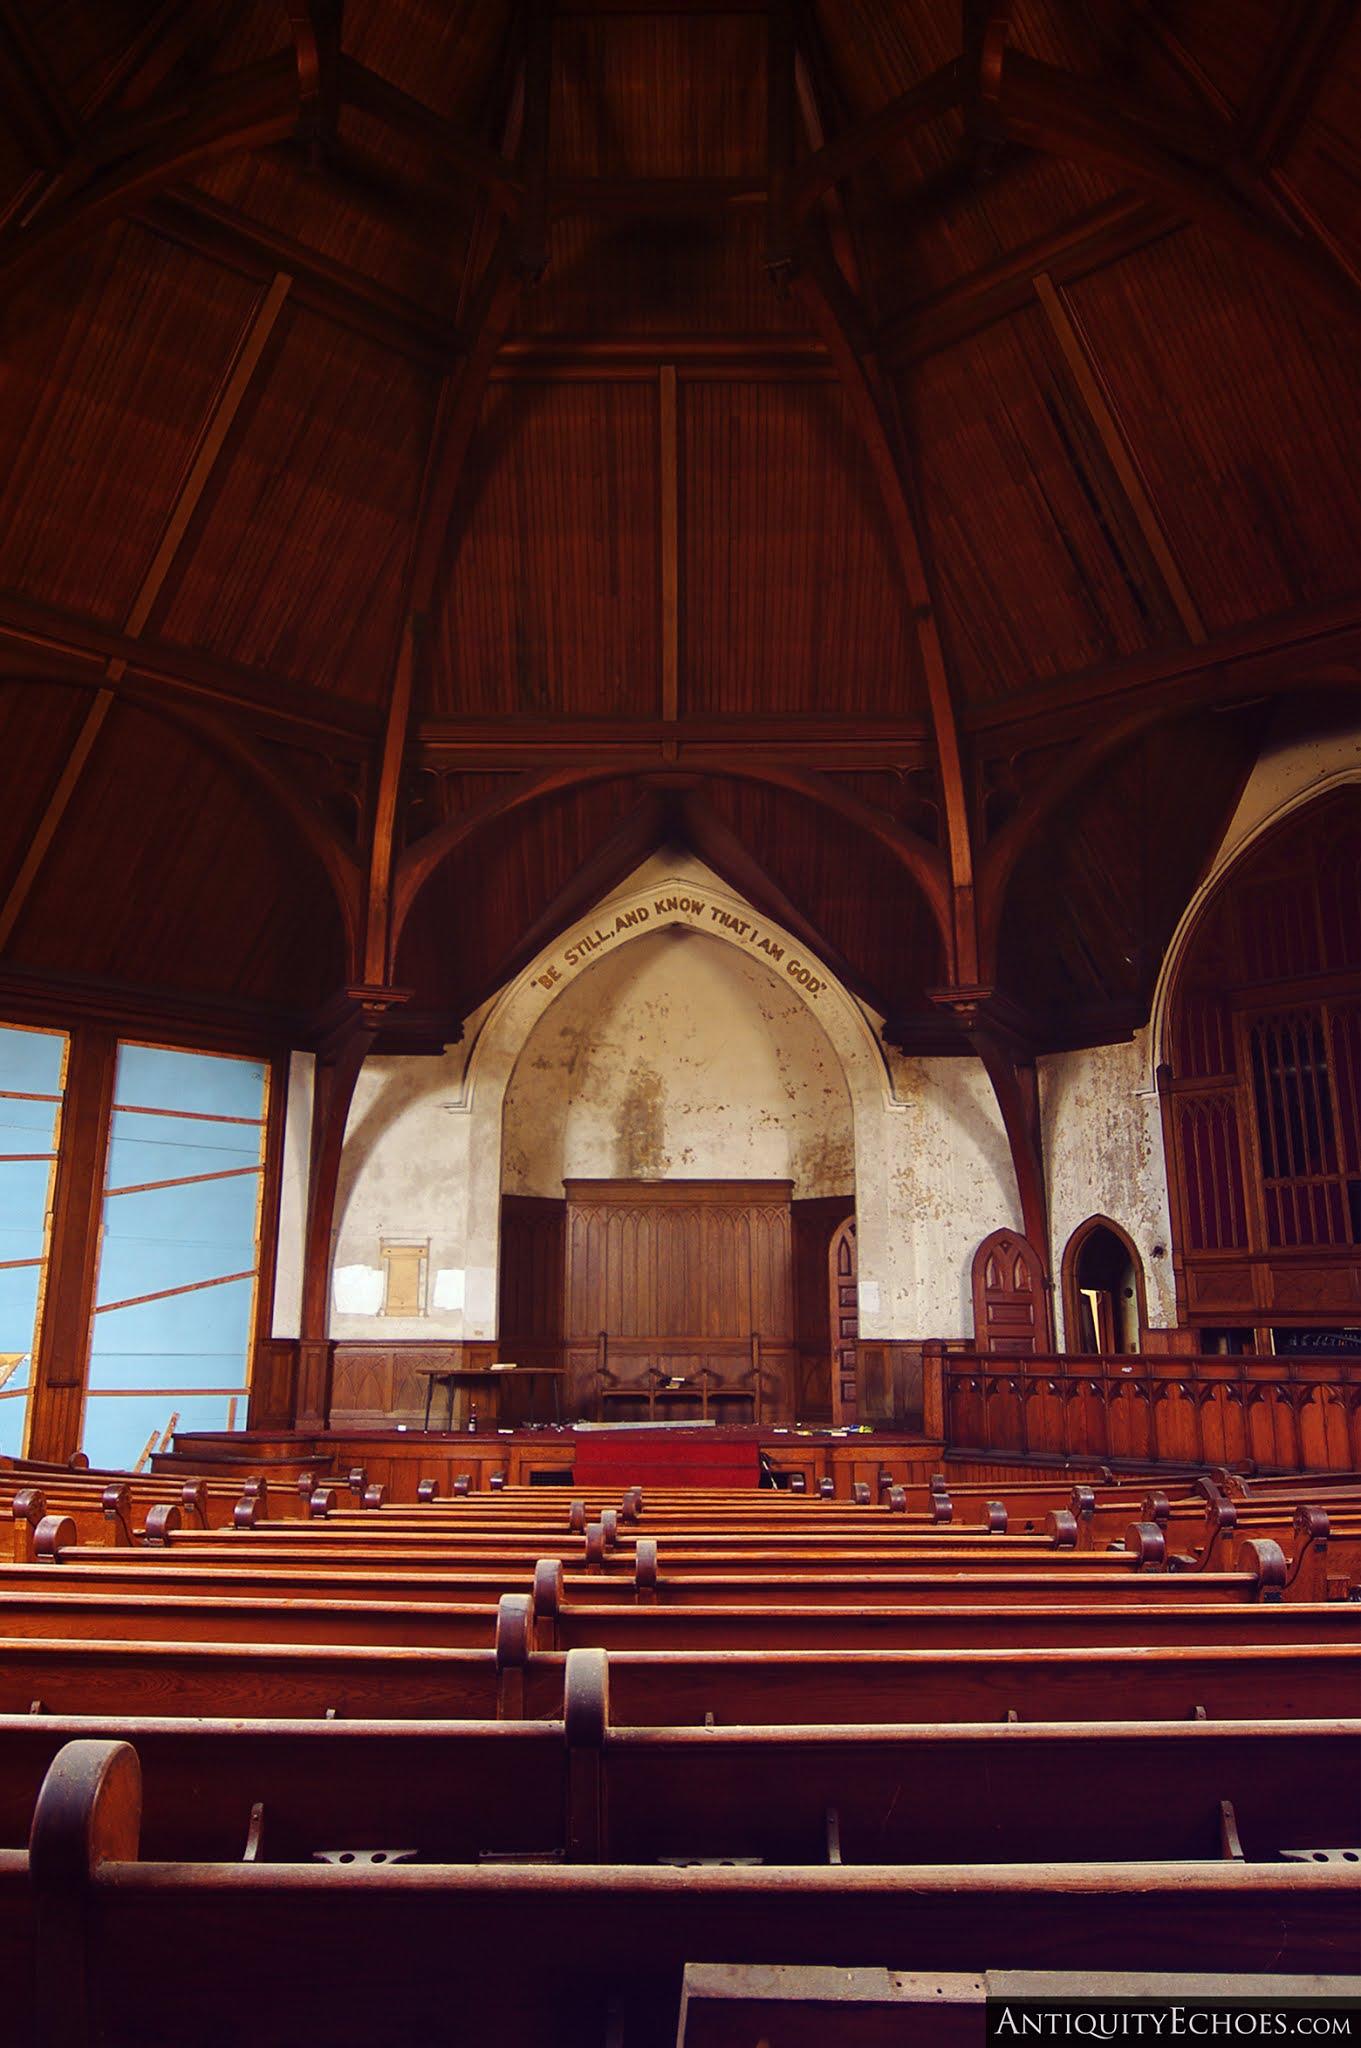 Third Presbyterian - Worship Hall and Vaulted Ceiling